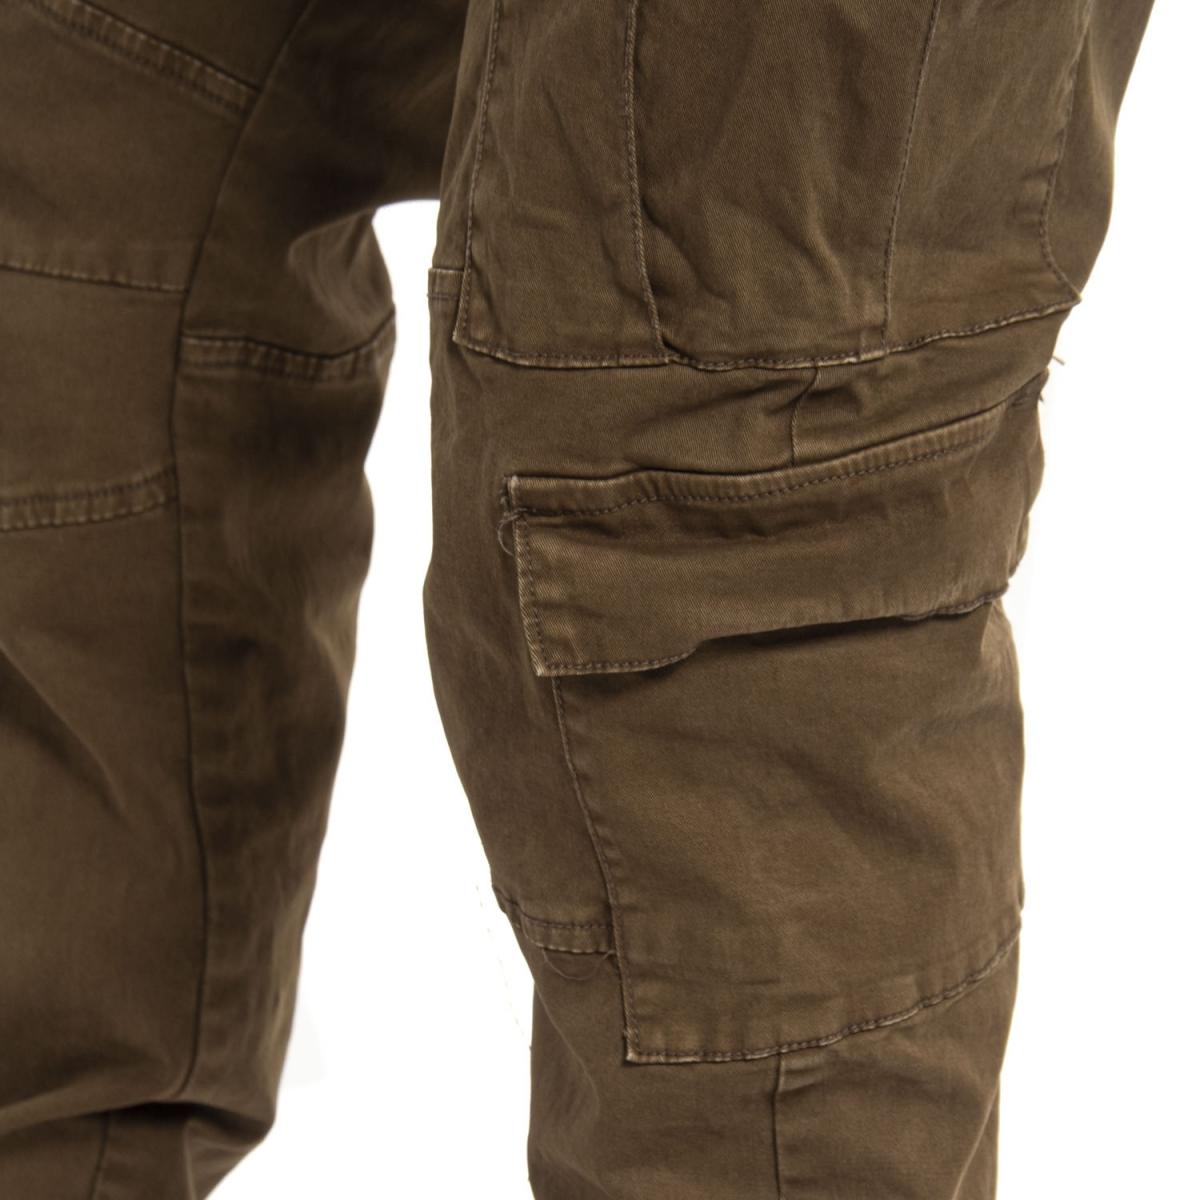 ropa Pantalones hombre Pantalone LPP0010 LANDEK PARK Cafedelmar Shop